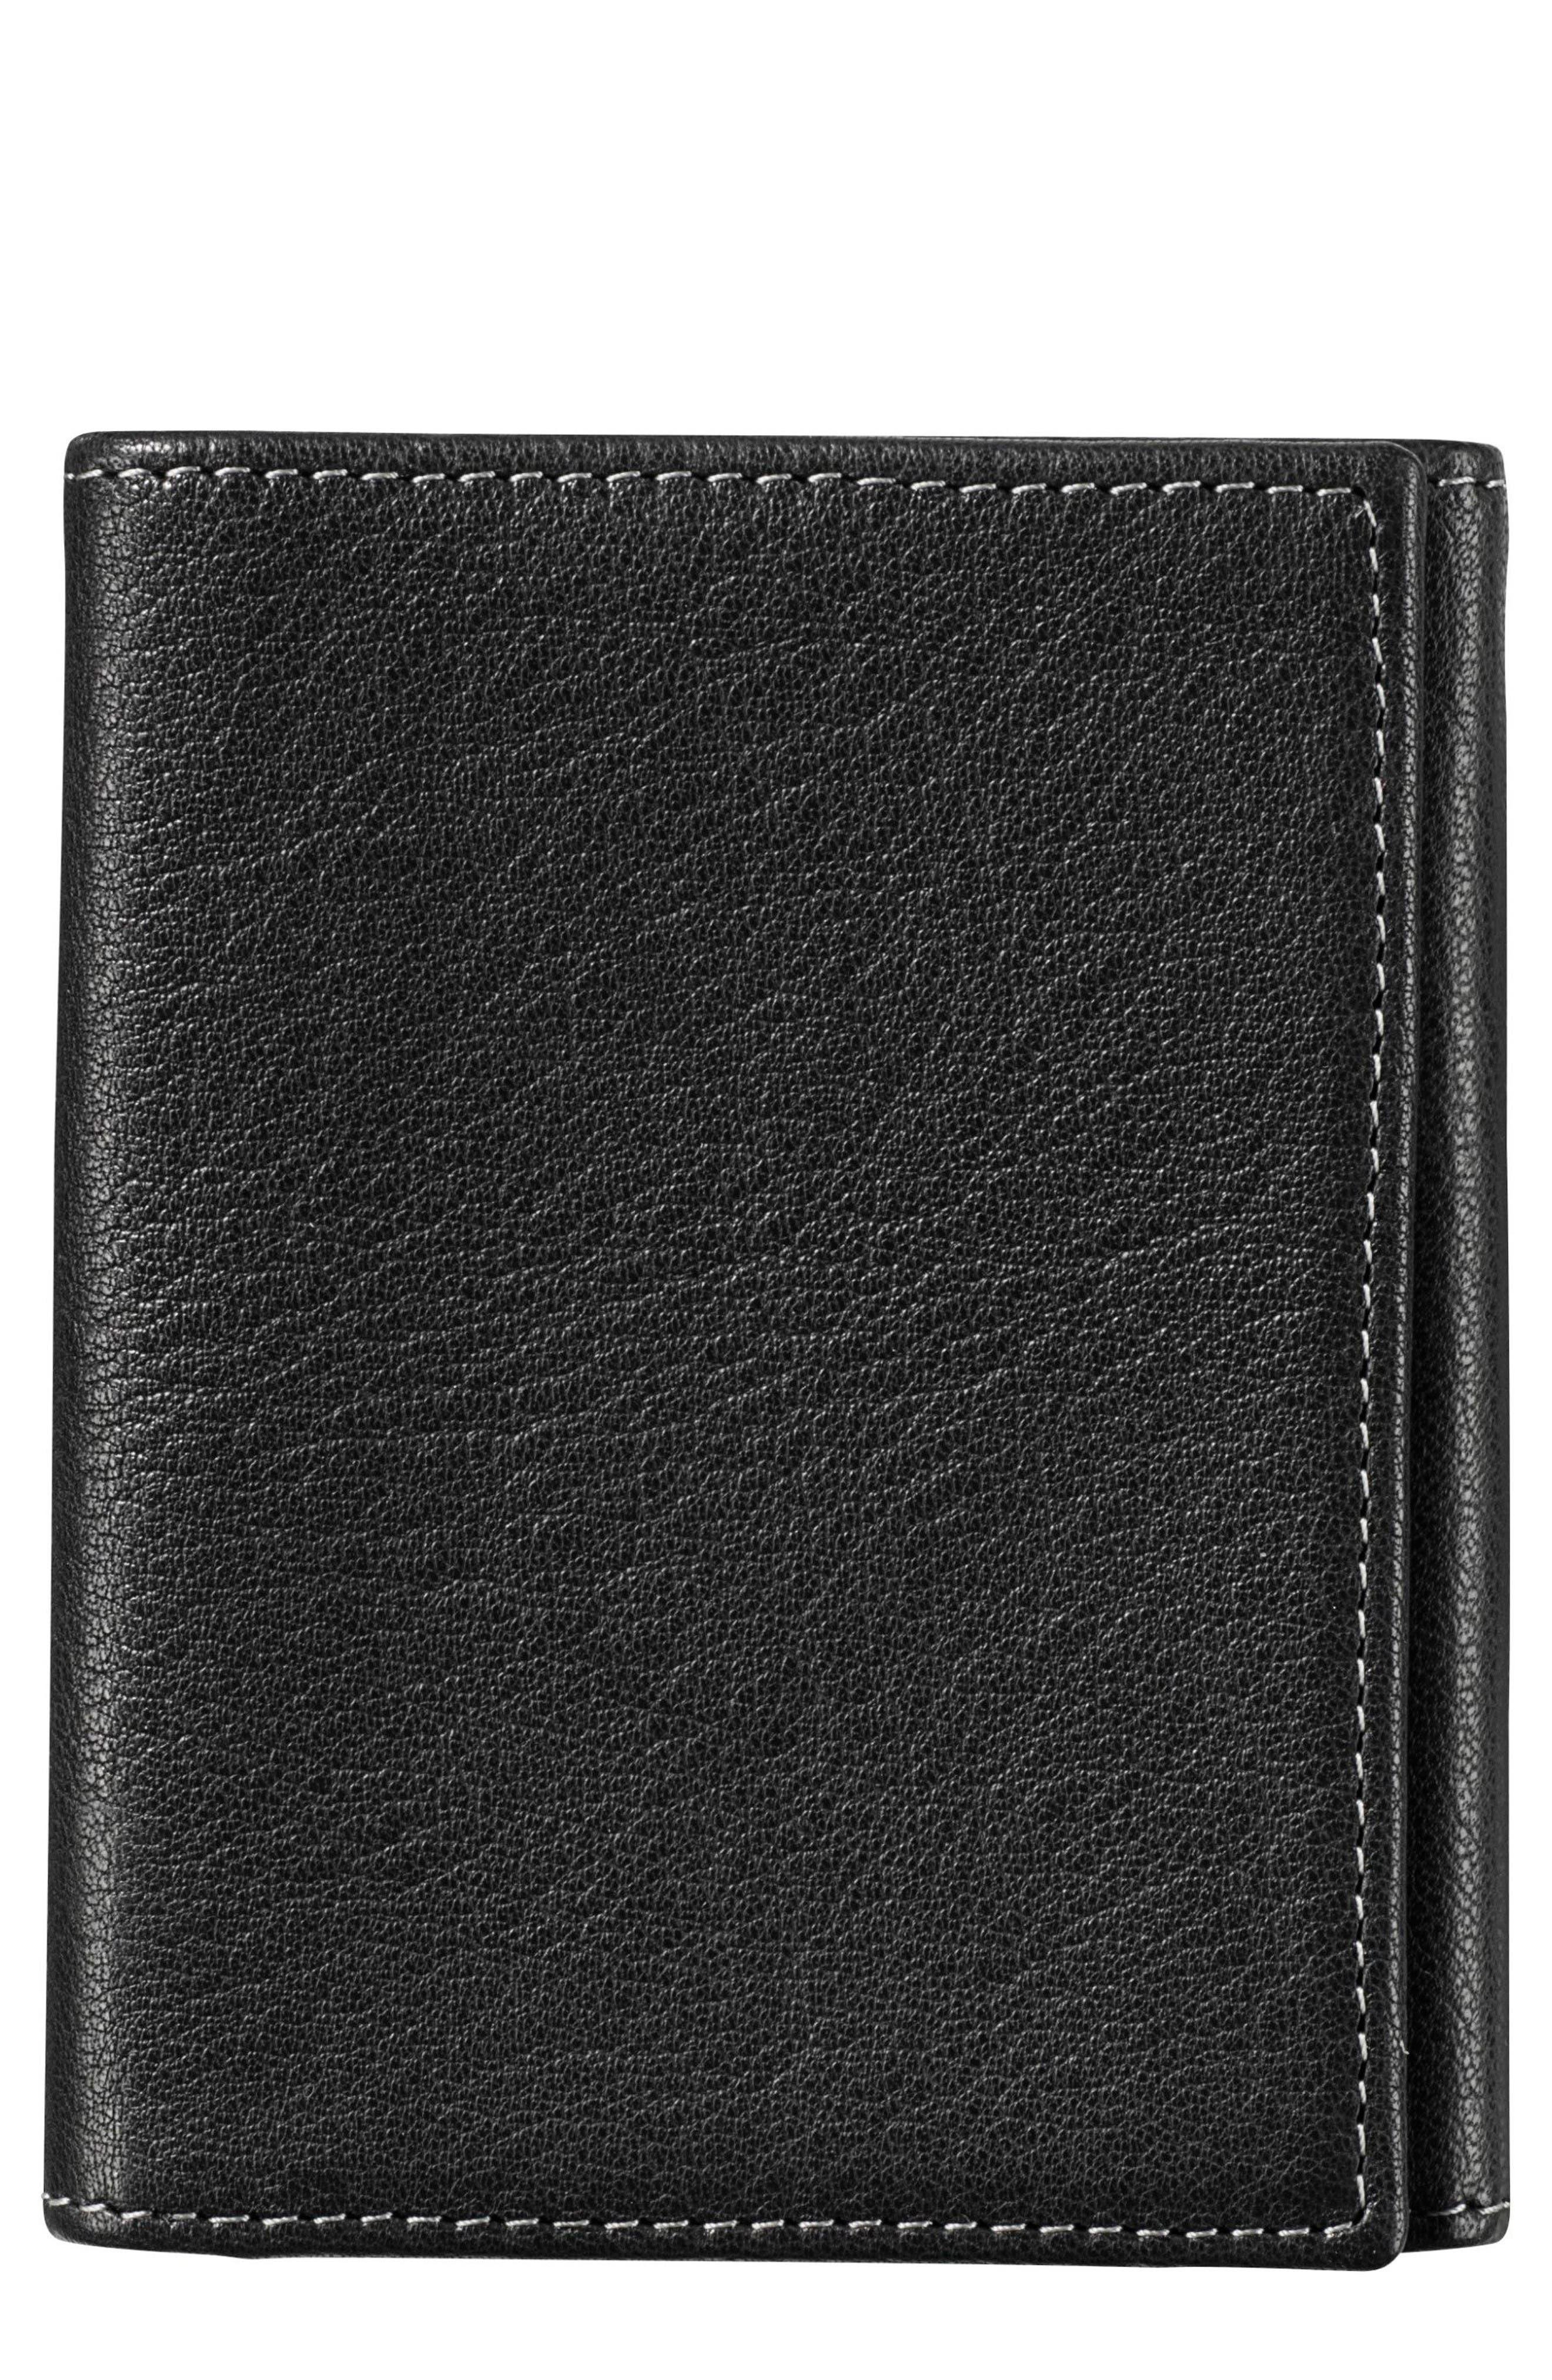 Johnston & Murphy Leather Wallet